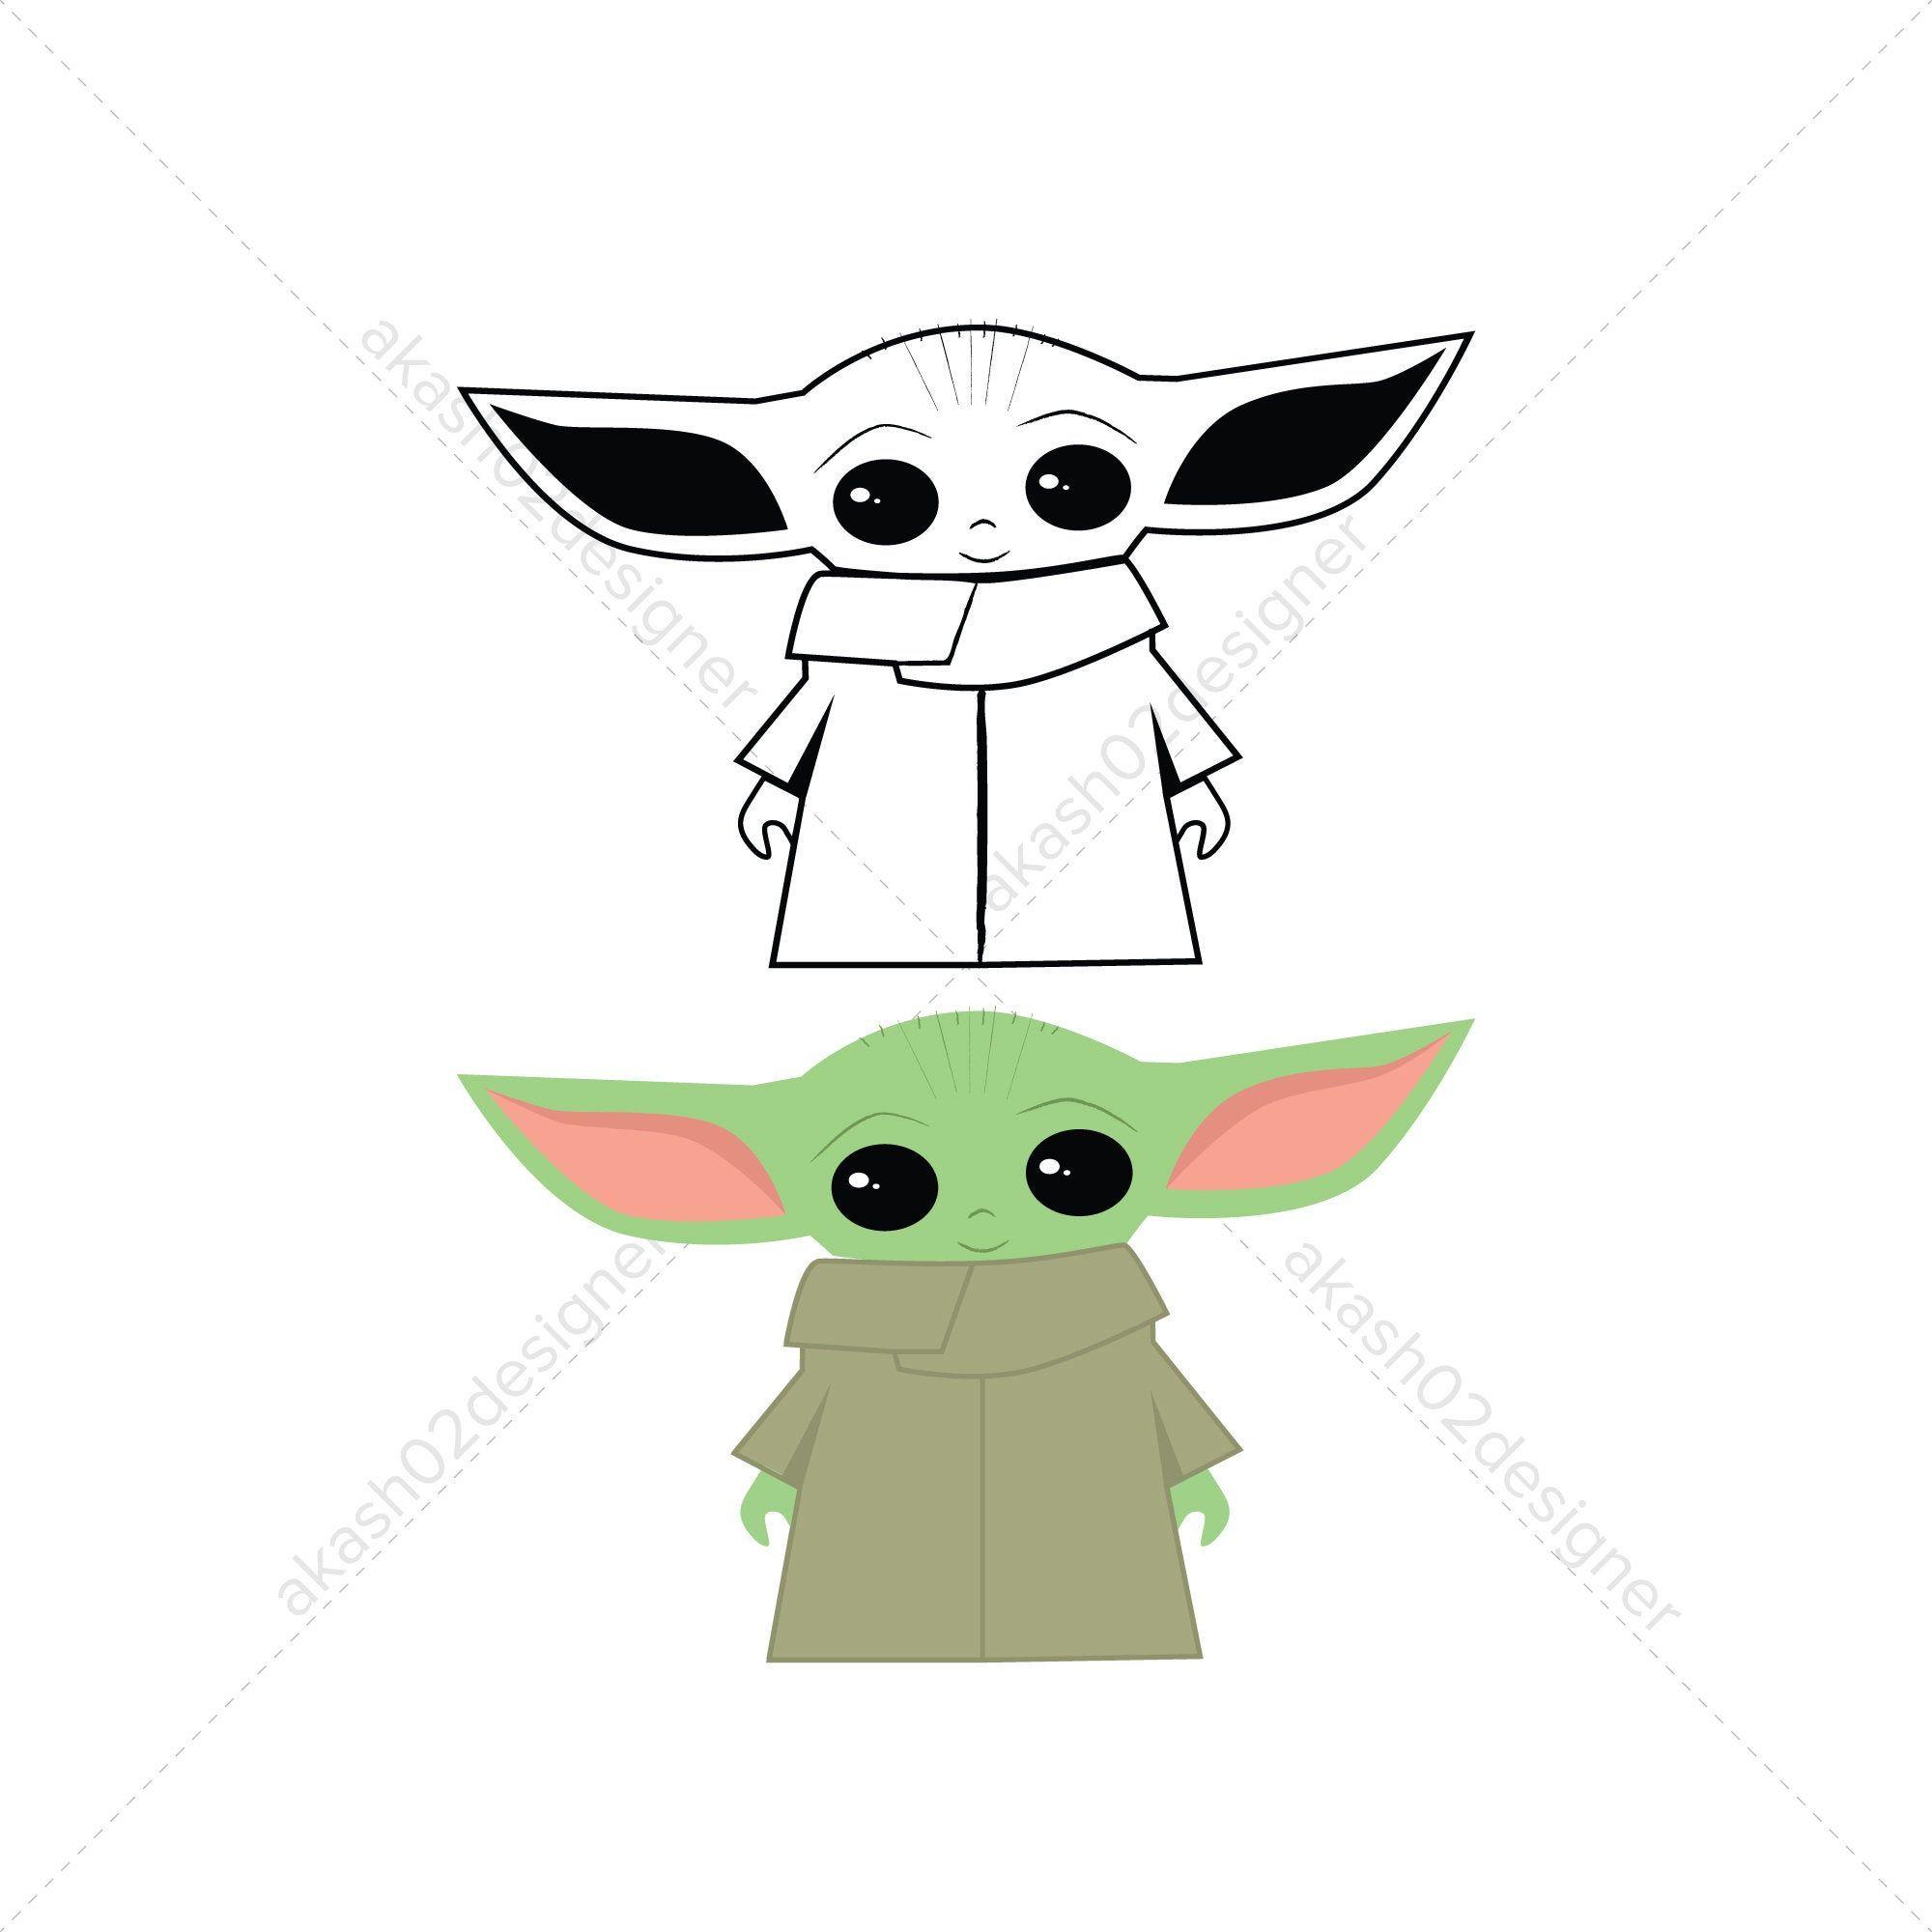 Super Cute Baby Yoda Svg Png Jpeg Ai Eps Digital File Etsy In 2021 Yoda Drawing Yoda Png Yoda Clipart